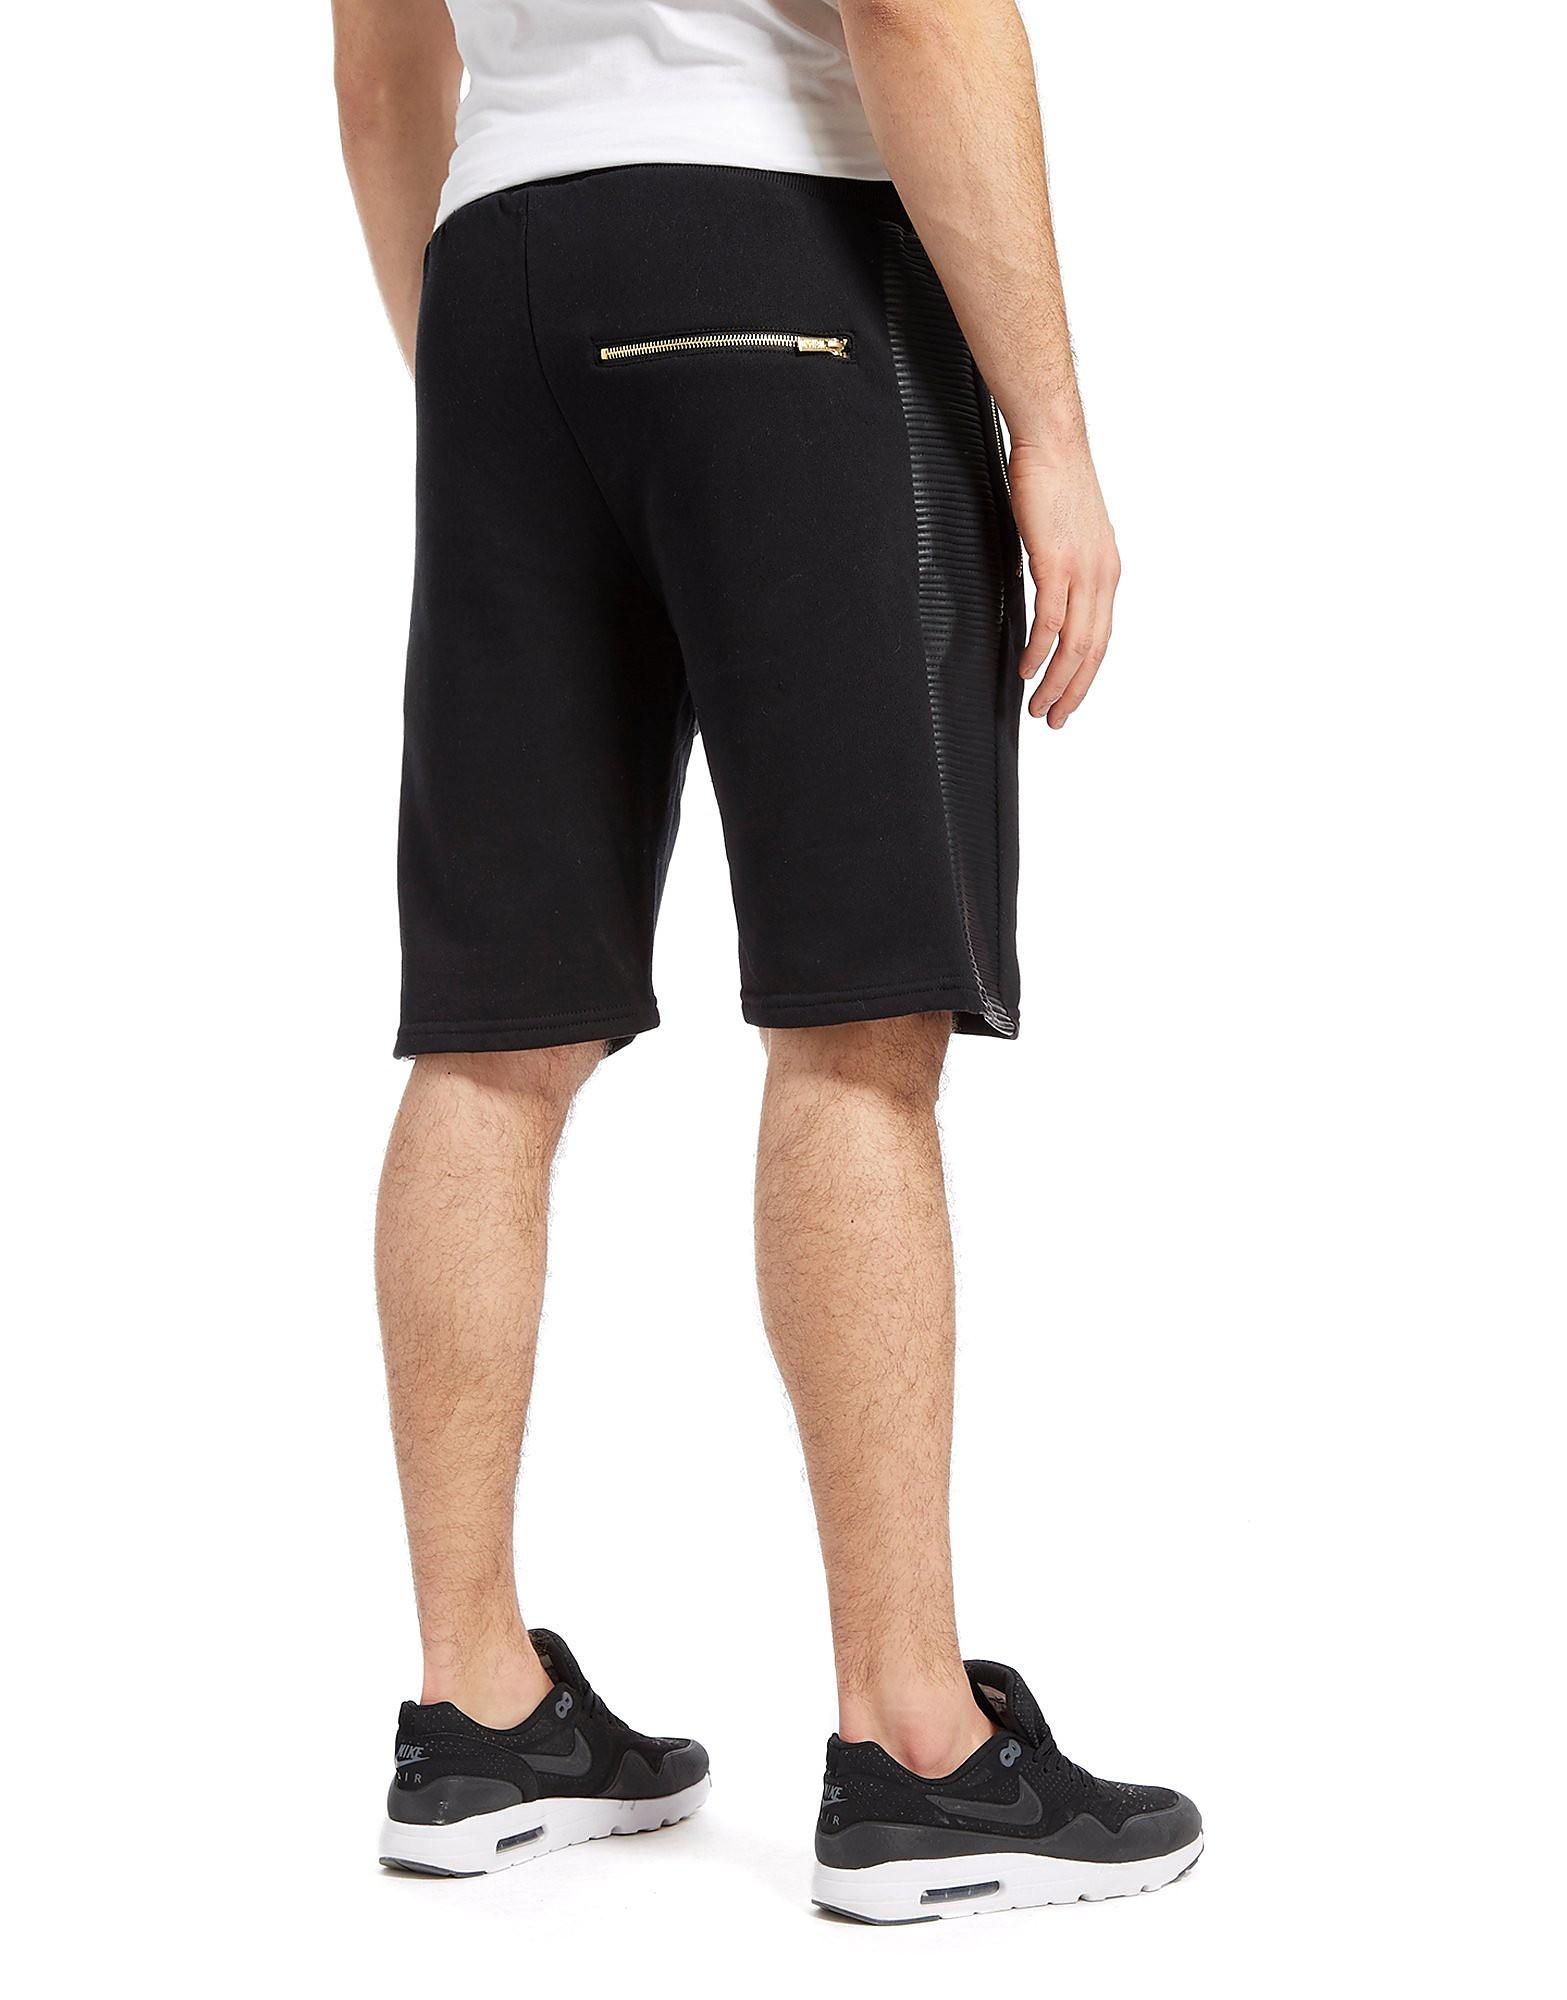 Supply & Demand Fleek Shorts